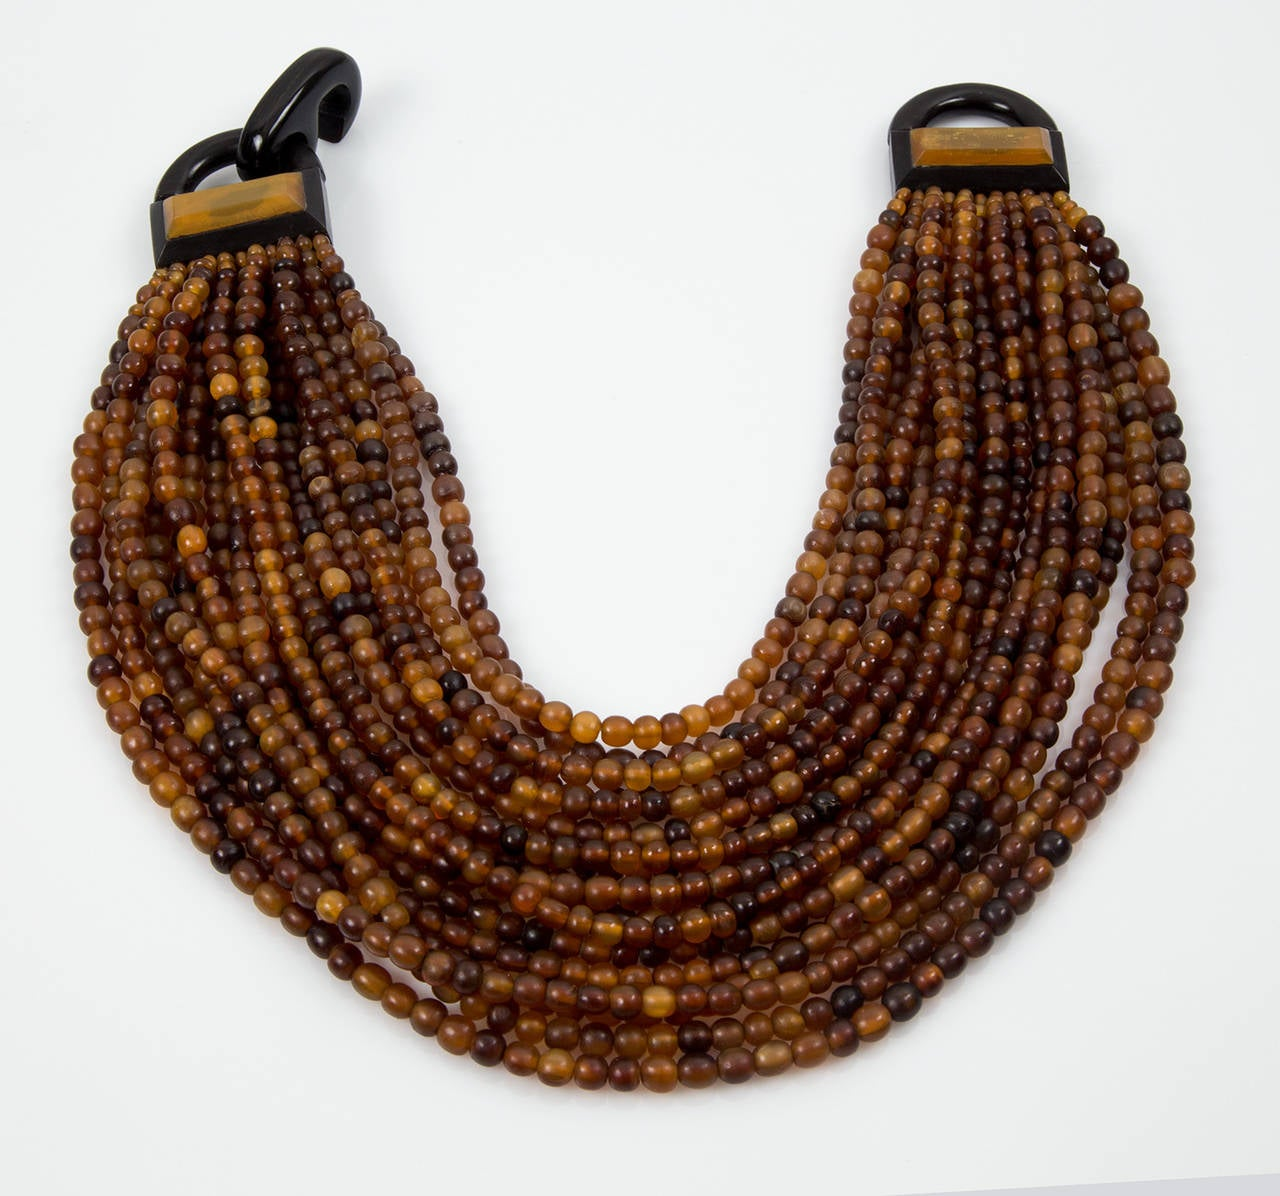 Gerda Lynggaard for Monies Multi Strand Horn Necklace and Earrings 2